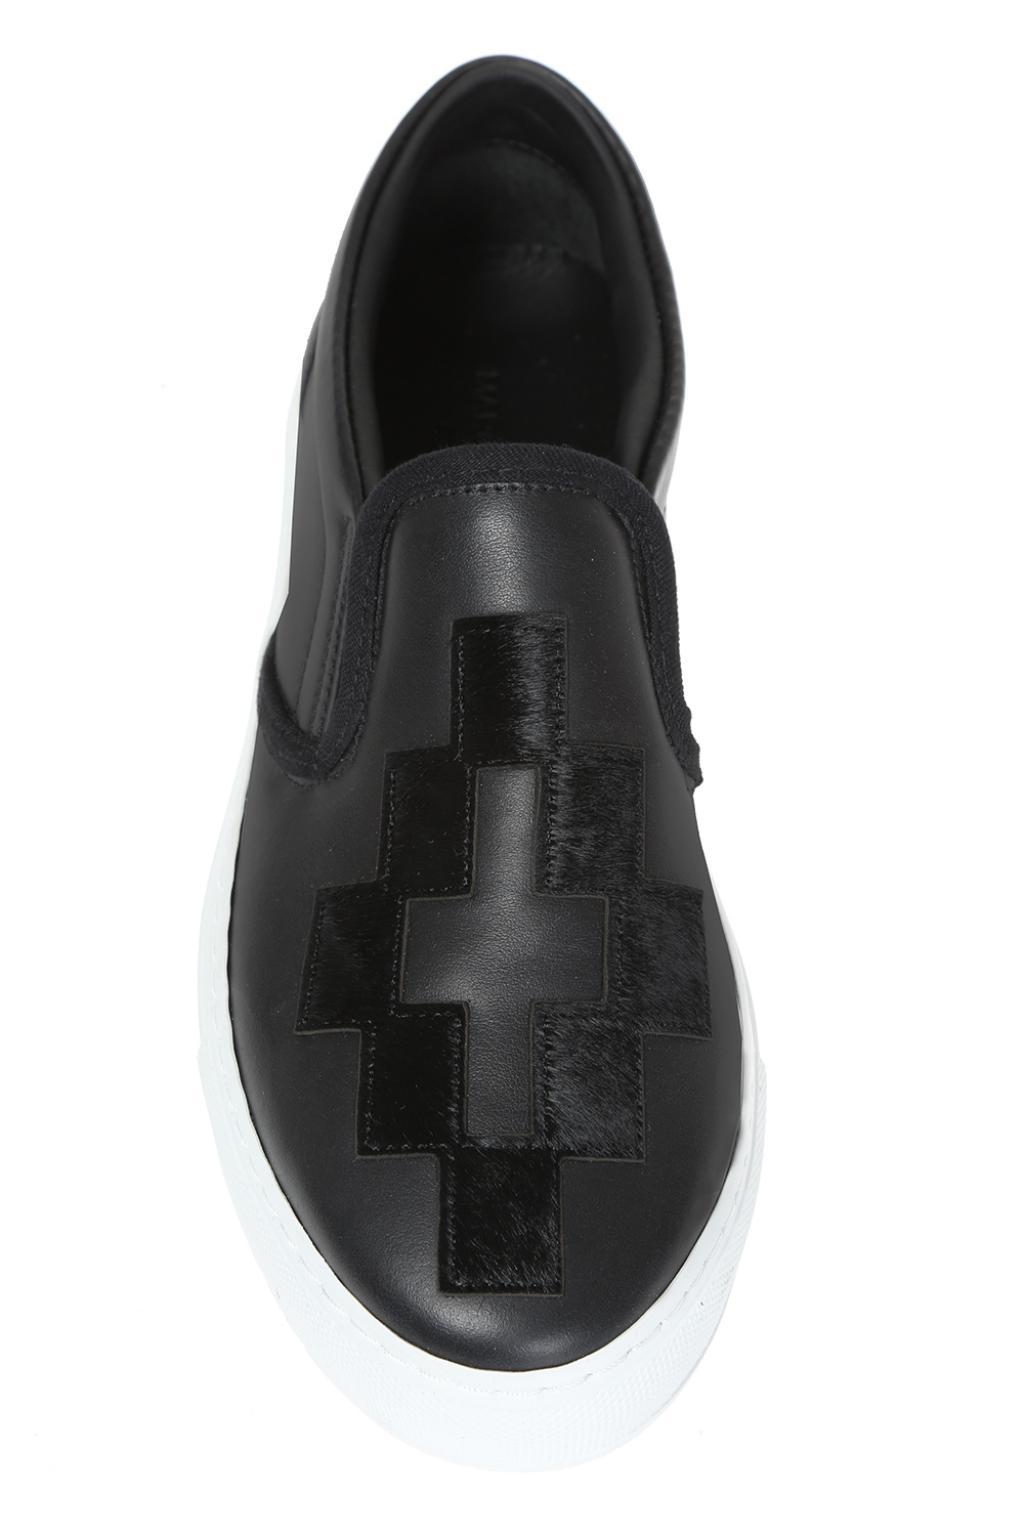 Marcelo Burlon Fur Slip-on Sneakers in Black